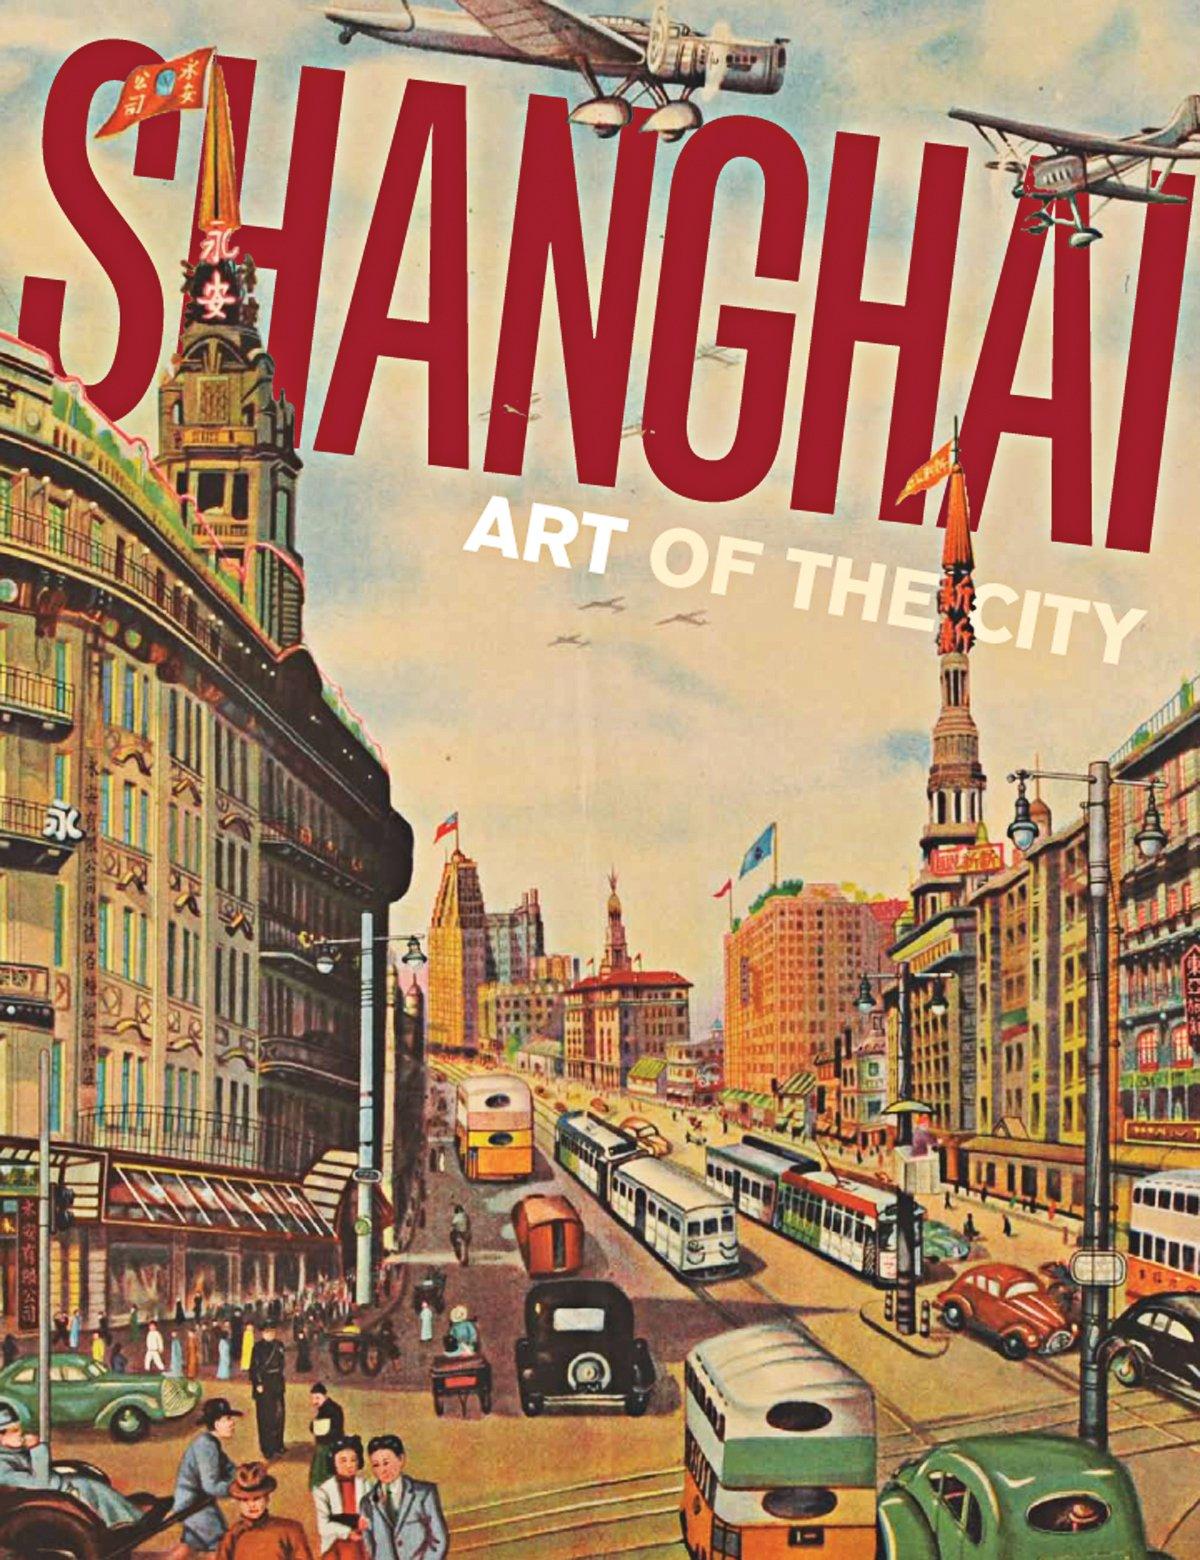 Amazon.com: Shanghai: Art of the City (9780939117543): Michael Knight, Dany  Chan: Books